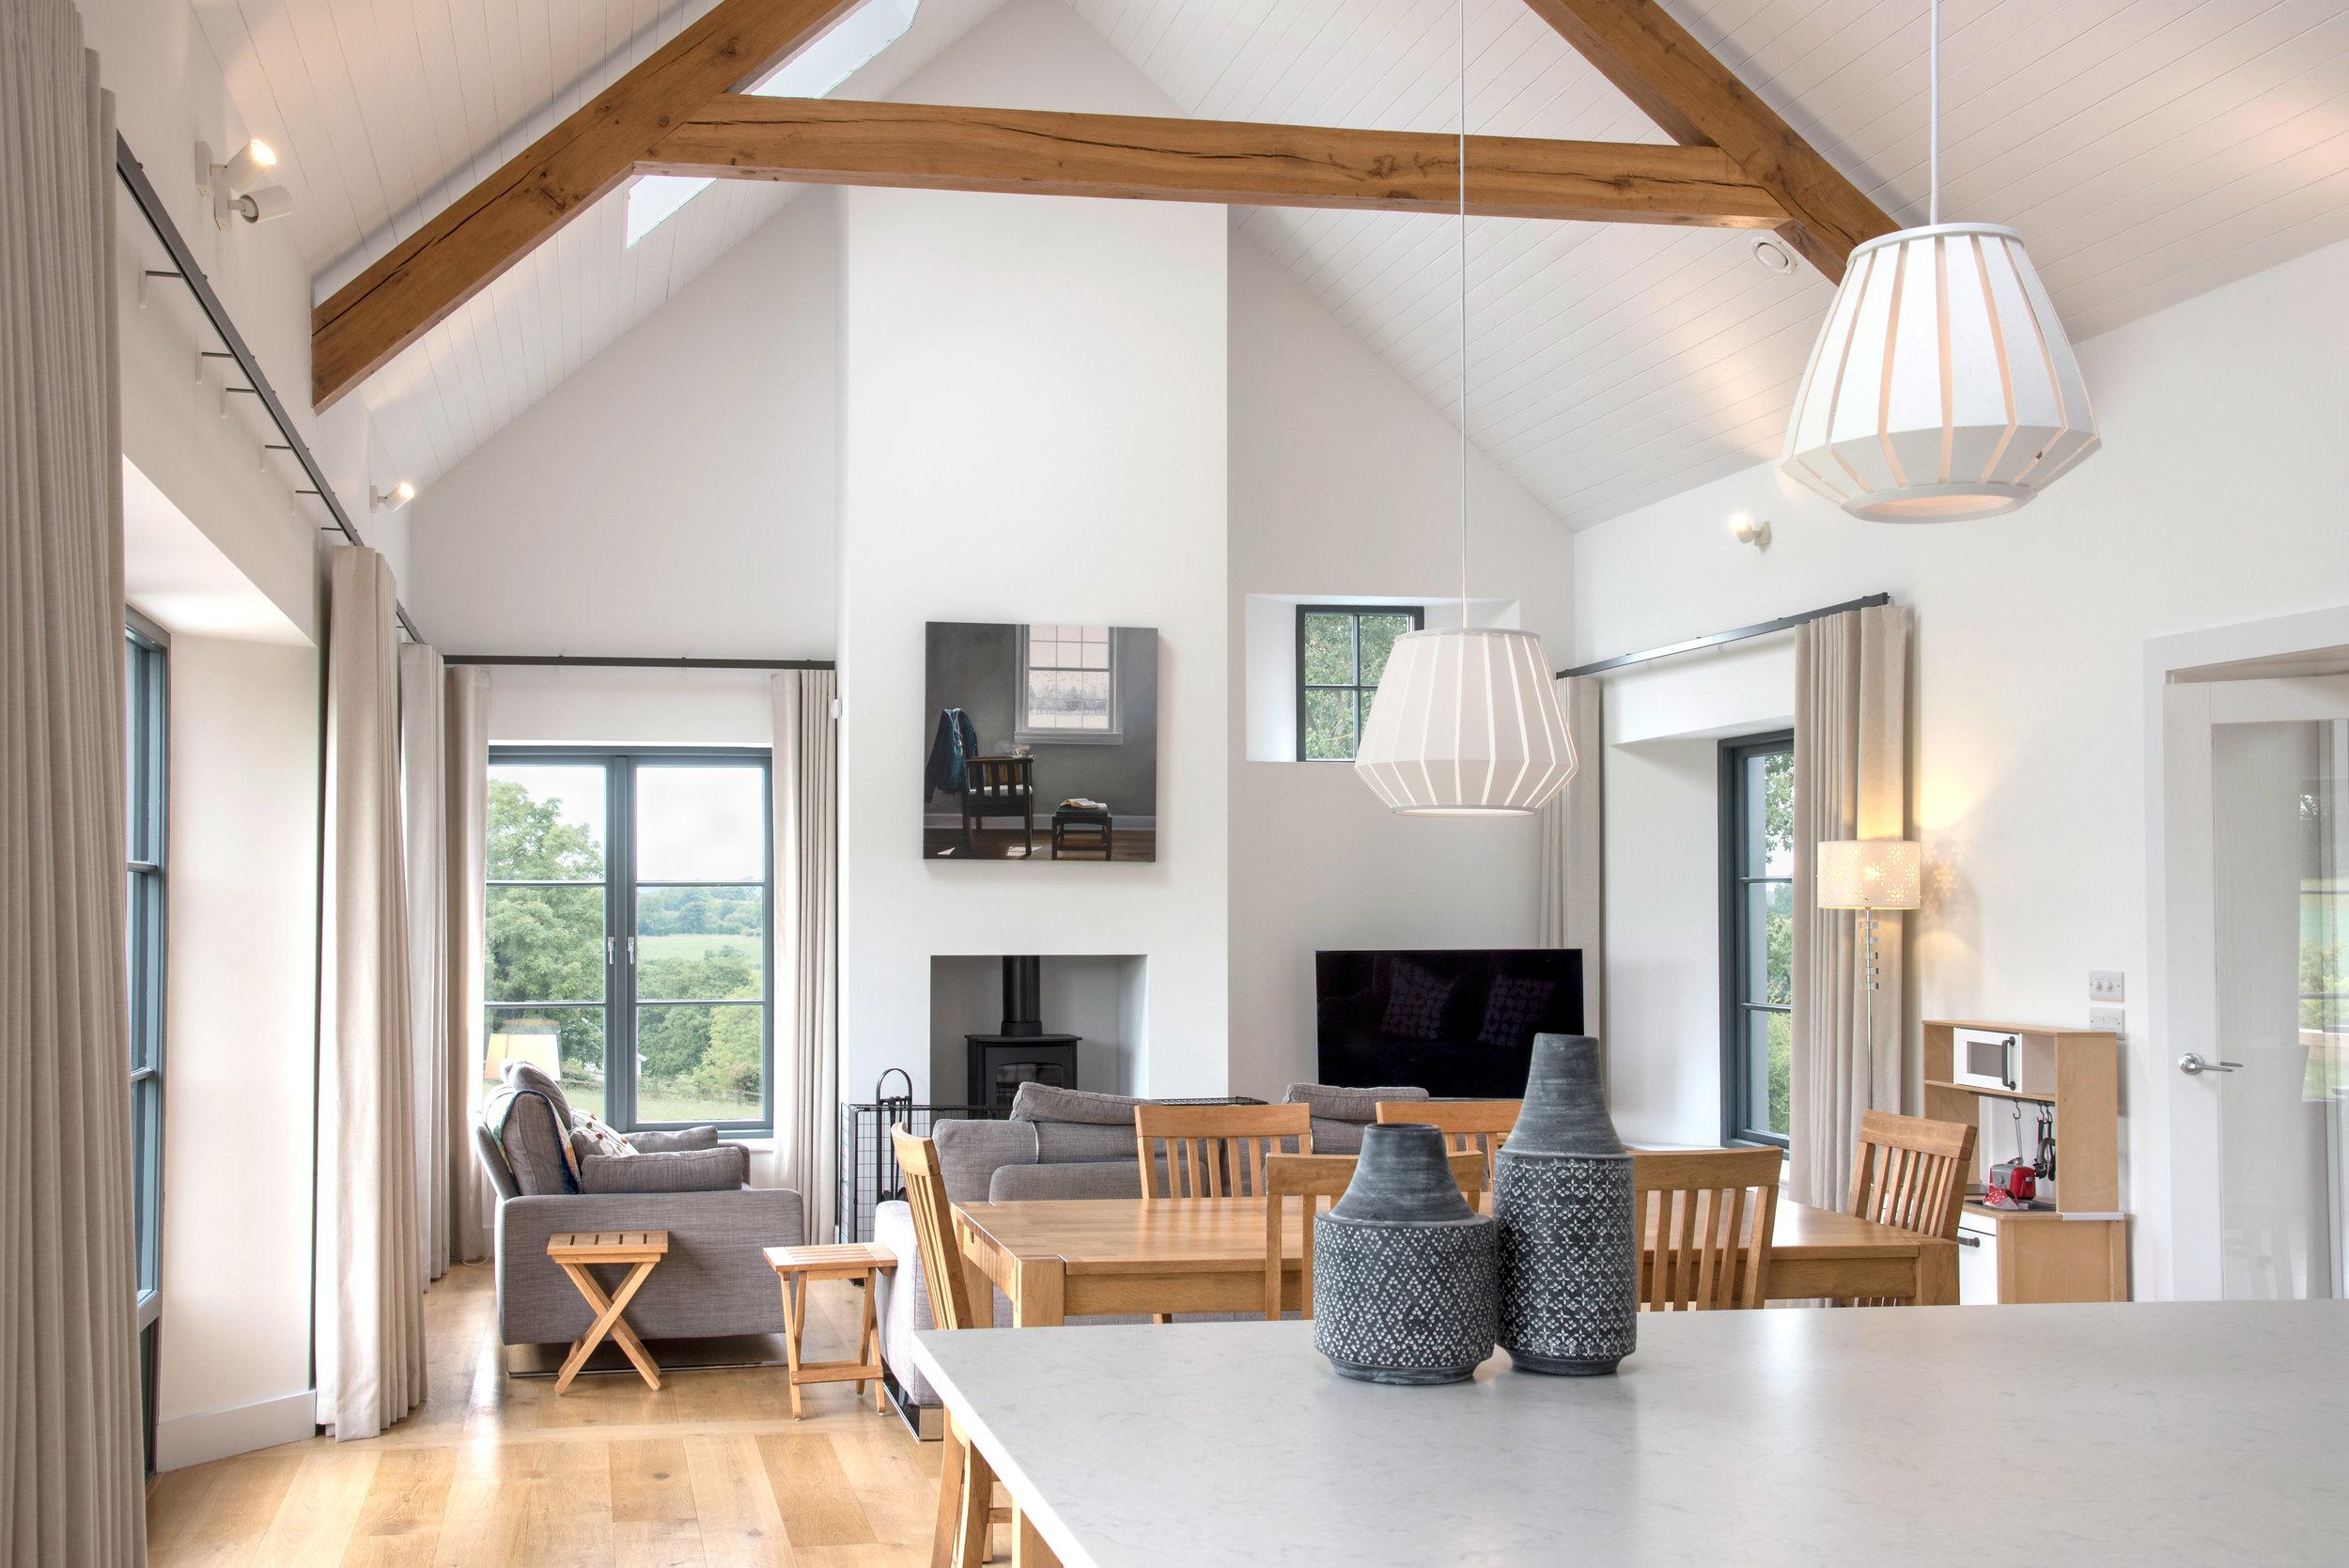 Paul_McAlister_Architects_Living_room.jpg